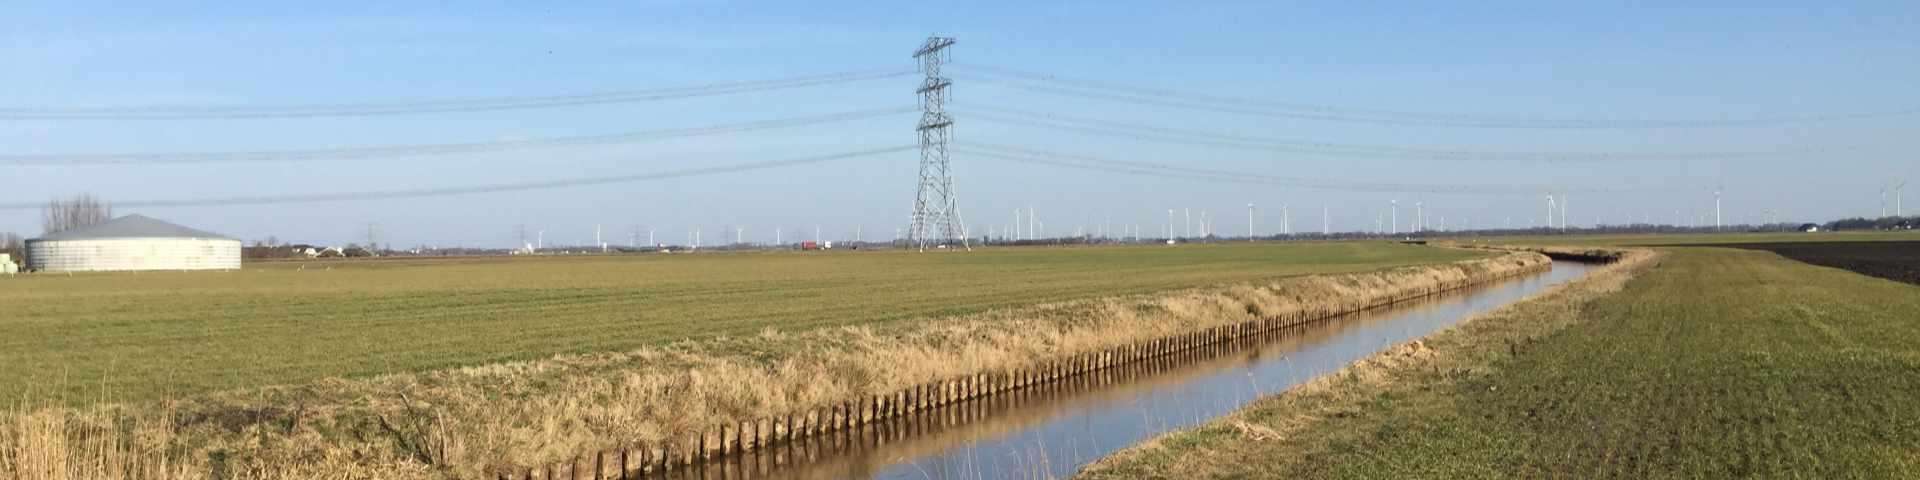 Nederland steeds duurzamer